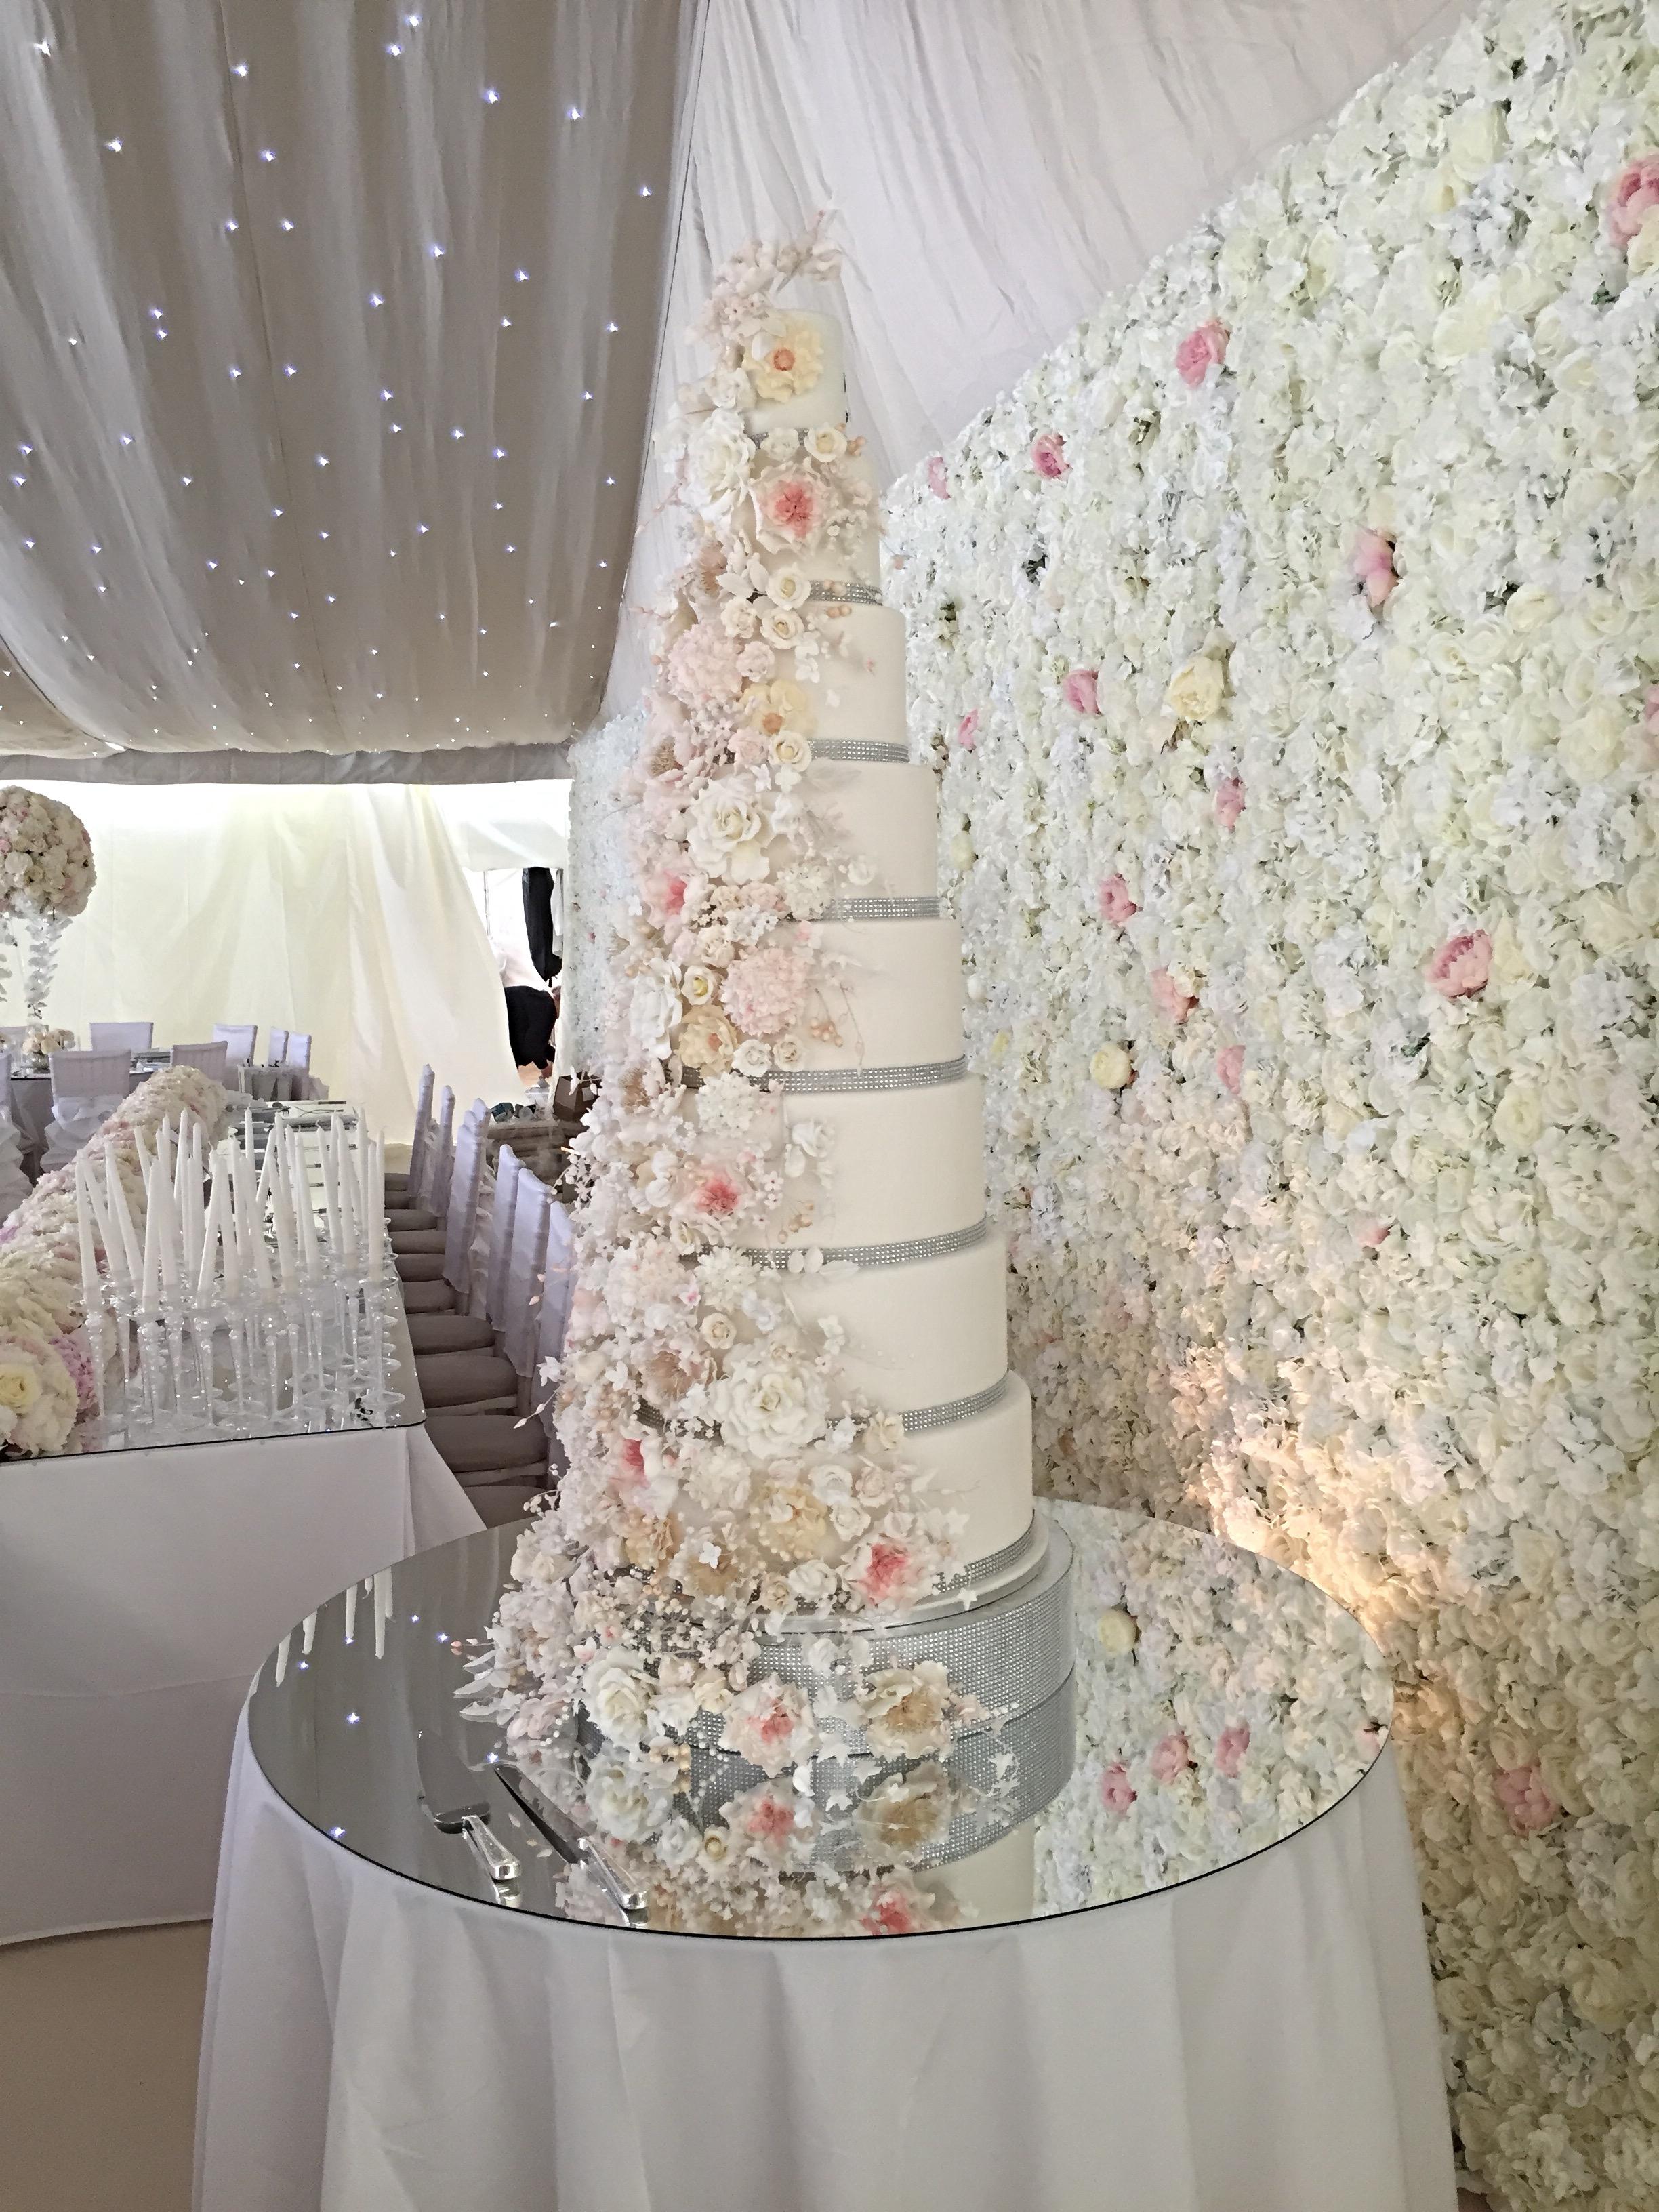 8 Tier Wedding Cake - Fruit Cake Factory